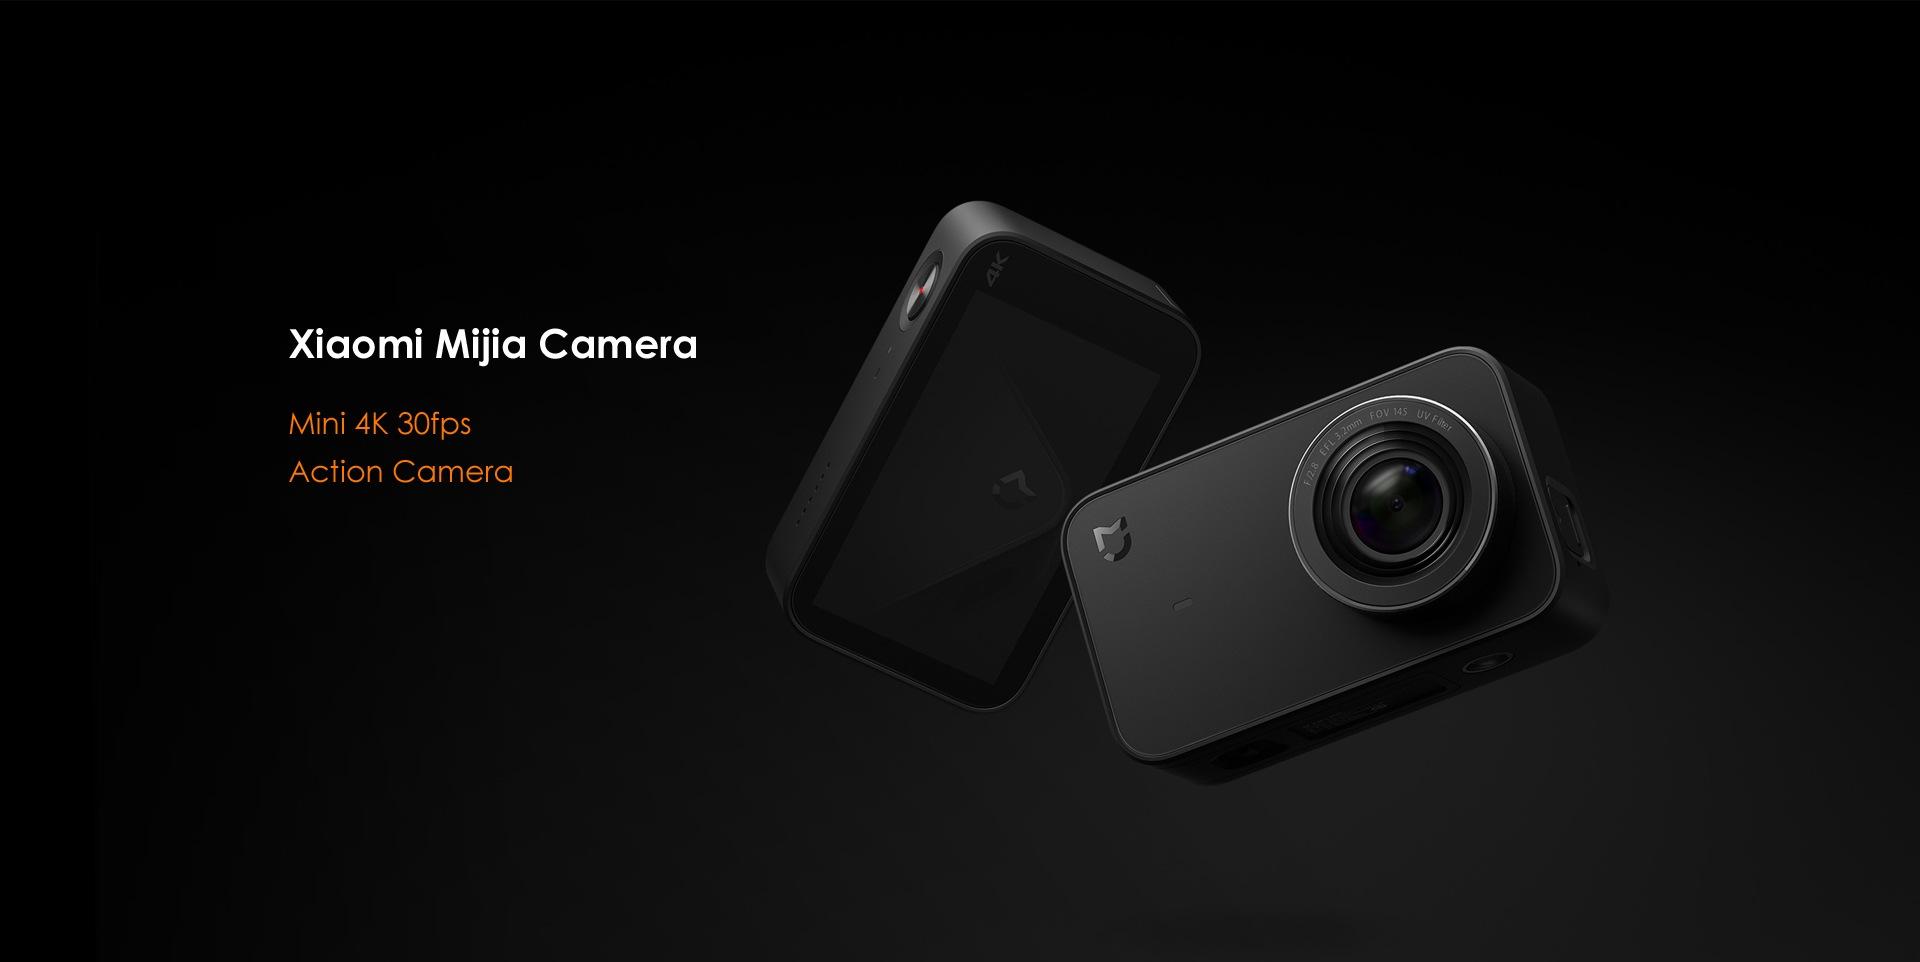 Xiaomi Mijia Camera Mini: získejte slevový kupón na outdoorovou kameru! [sponzorovaný článek]